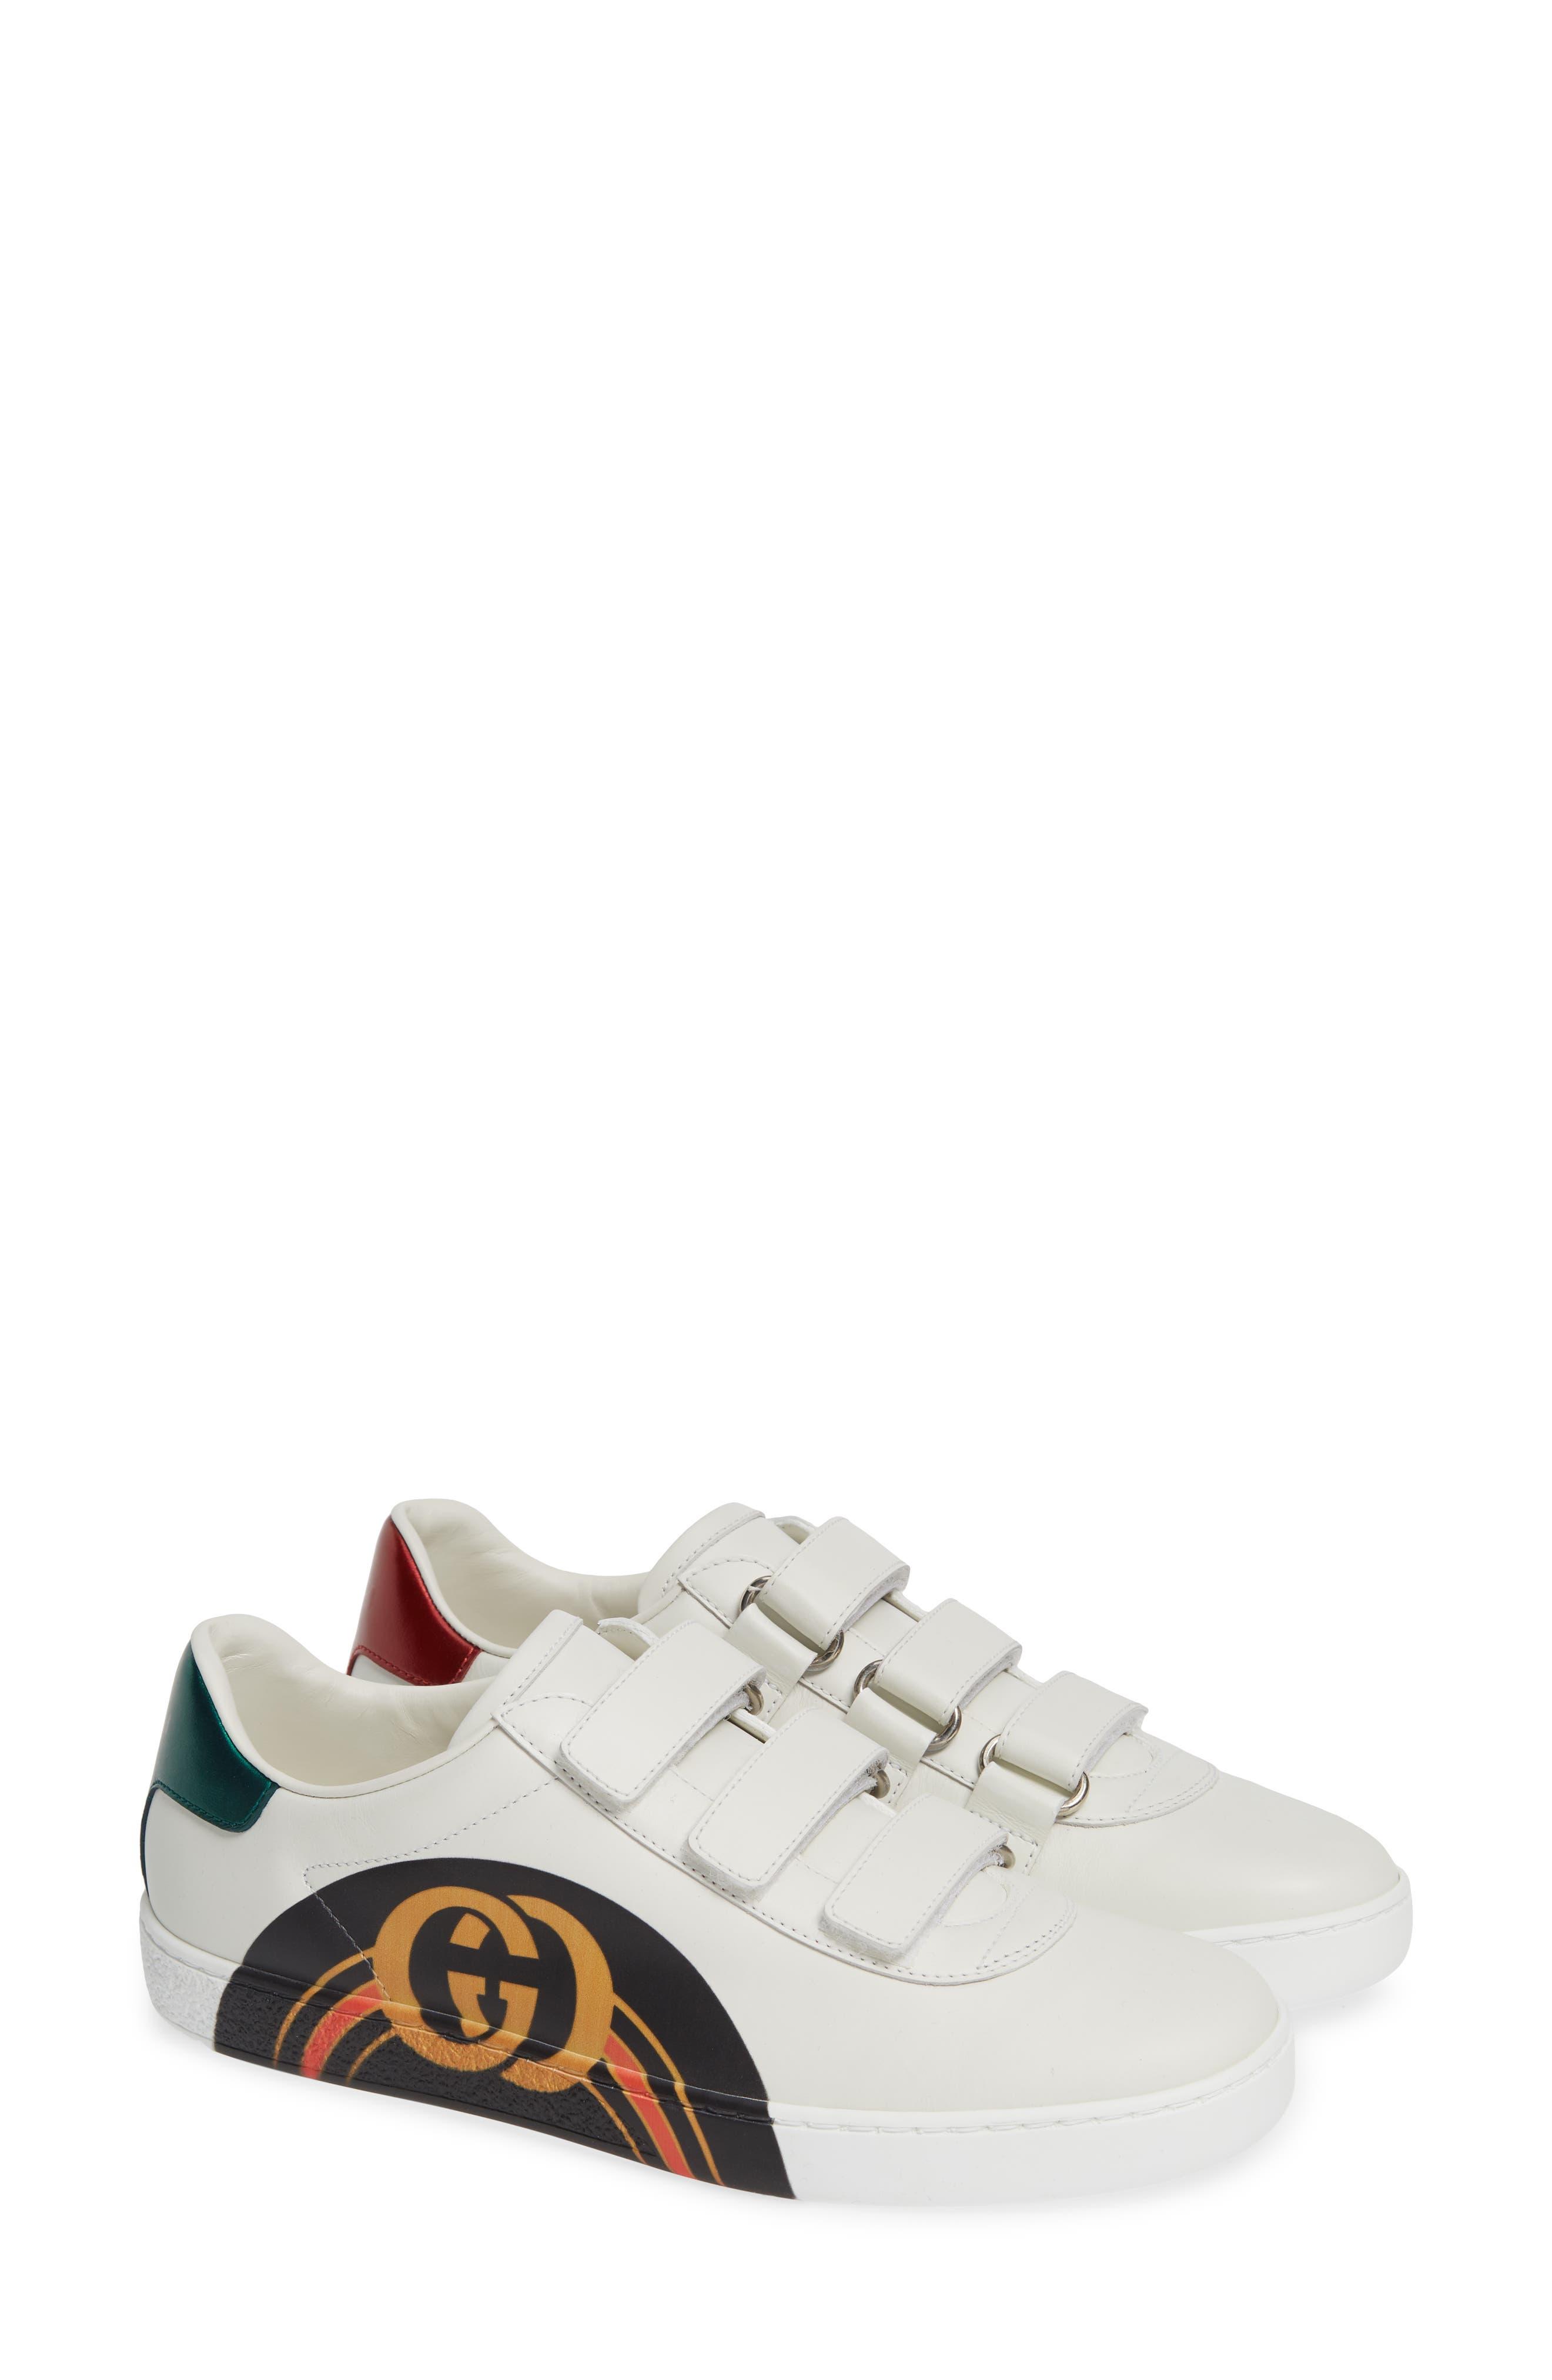 Gucci New Ace Sneaker - White